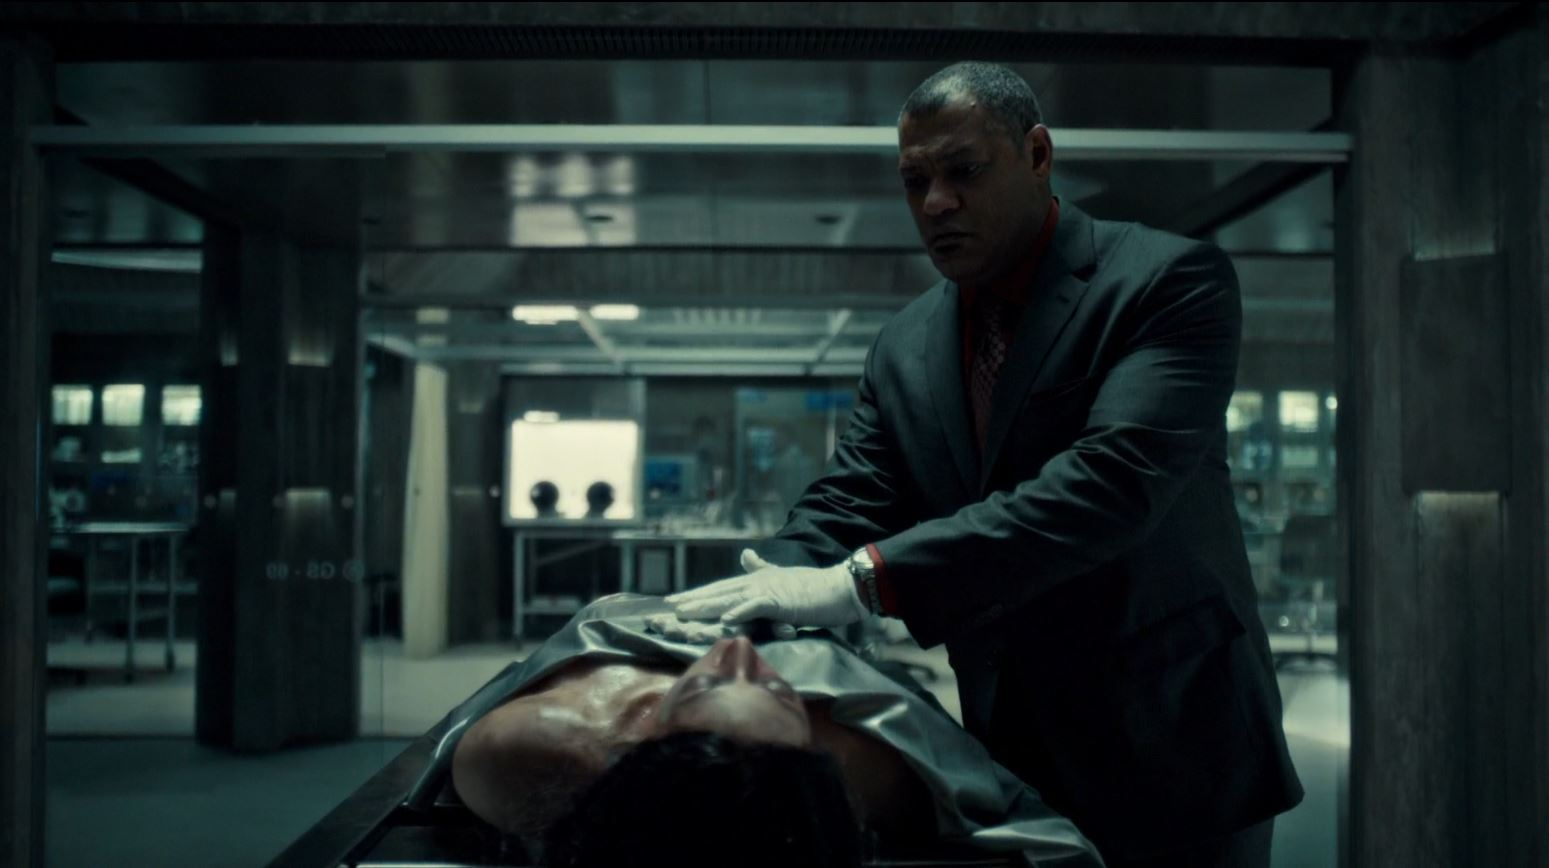 Hannibal Season 2 Episode 8 Su-zakana - Victim with a heartbeat